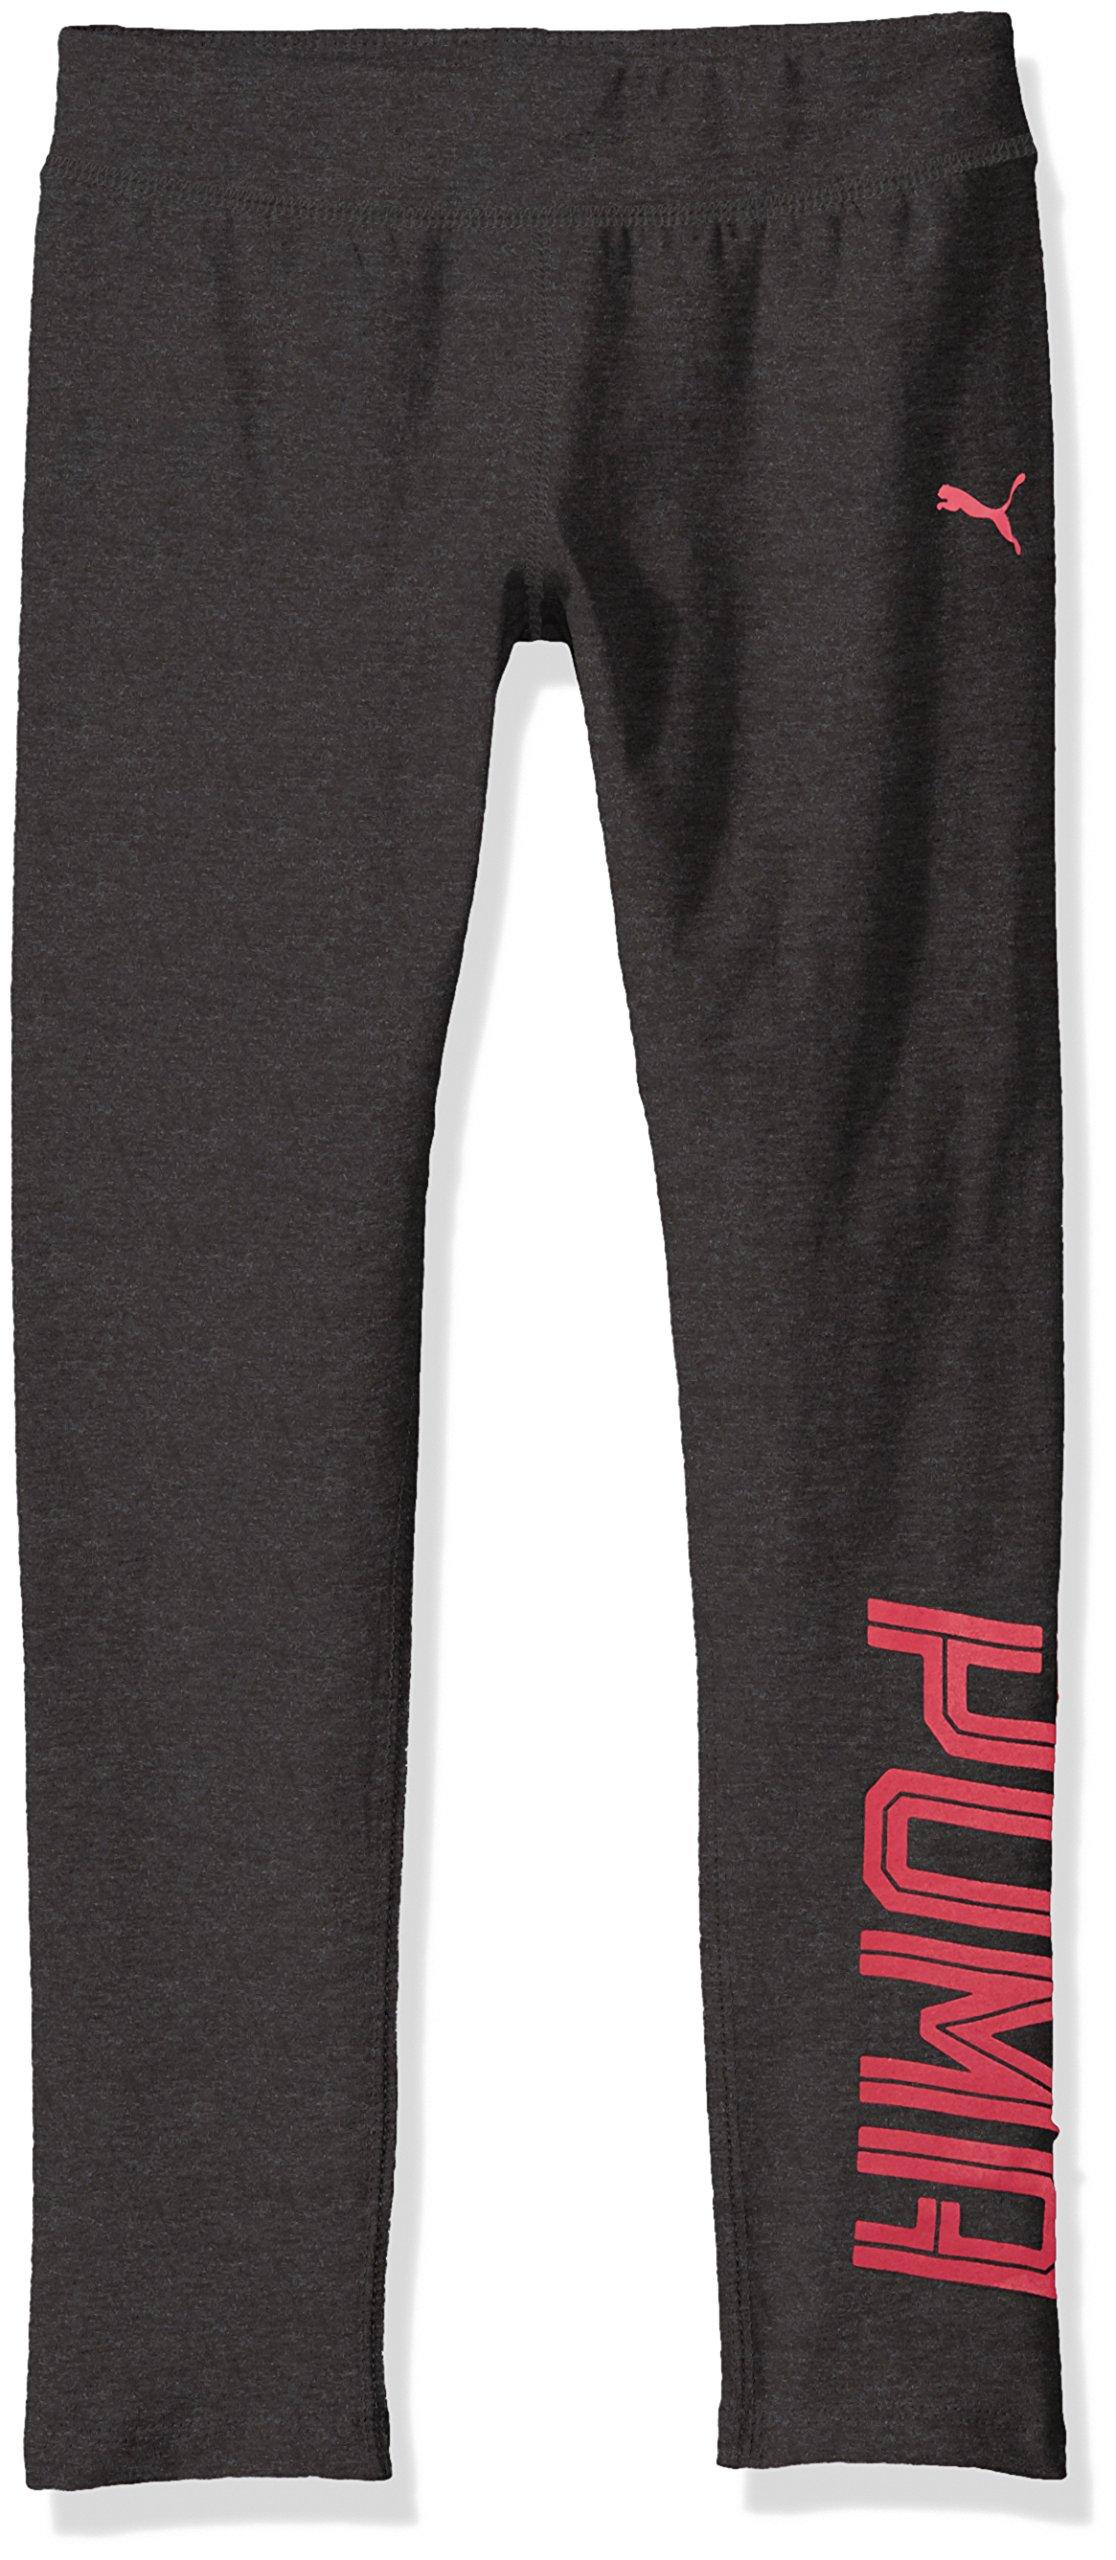 PUMA Big Girls' Logo Legging, Dark Heather Grey, Large (12/14)